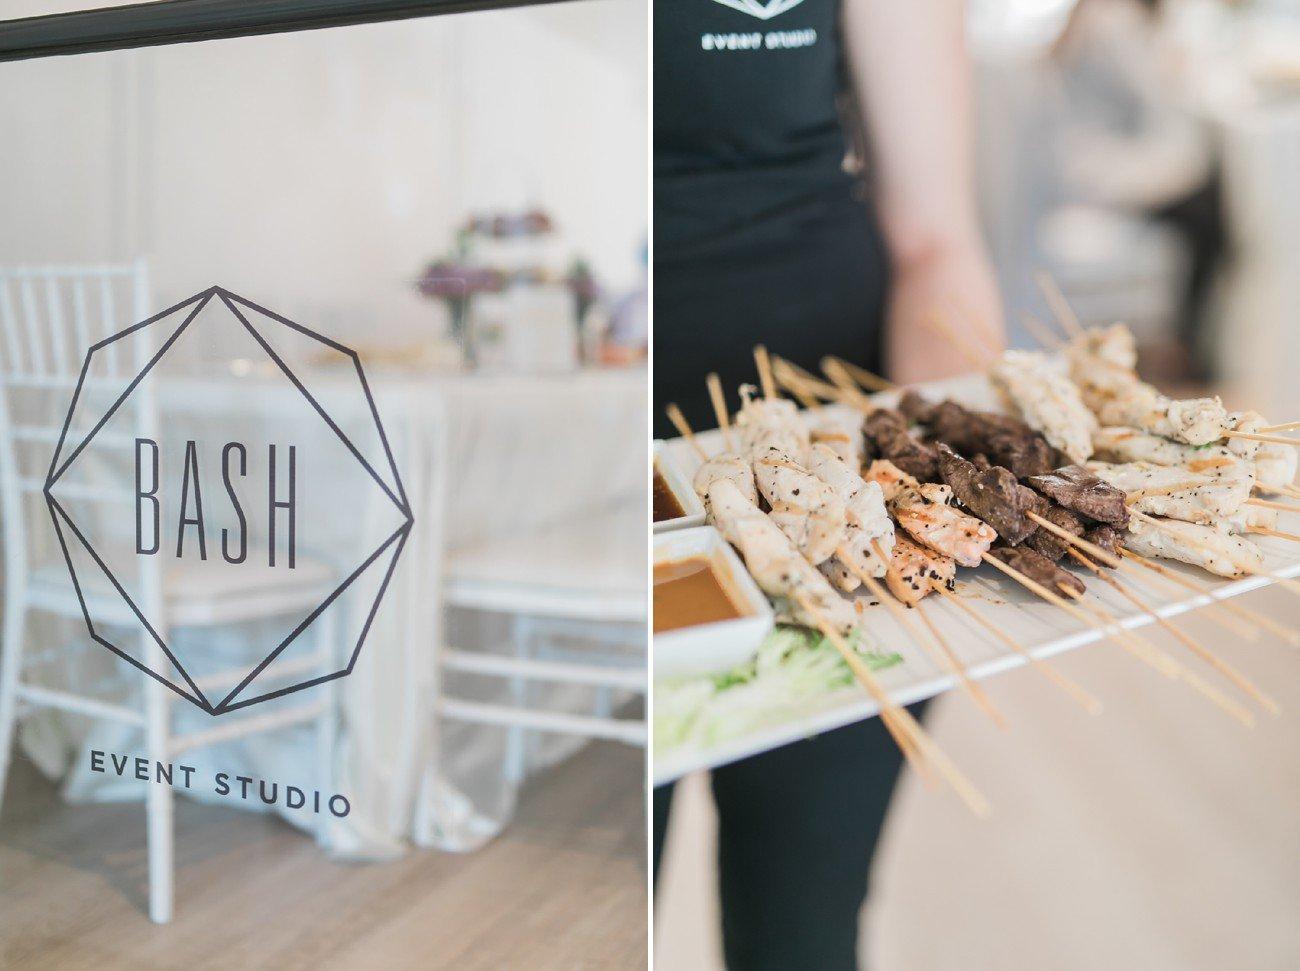 Toronto Baby Shower Bash Event Studio